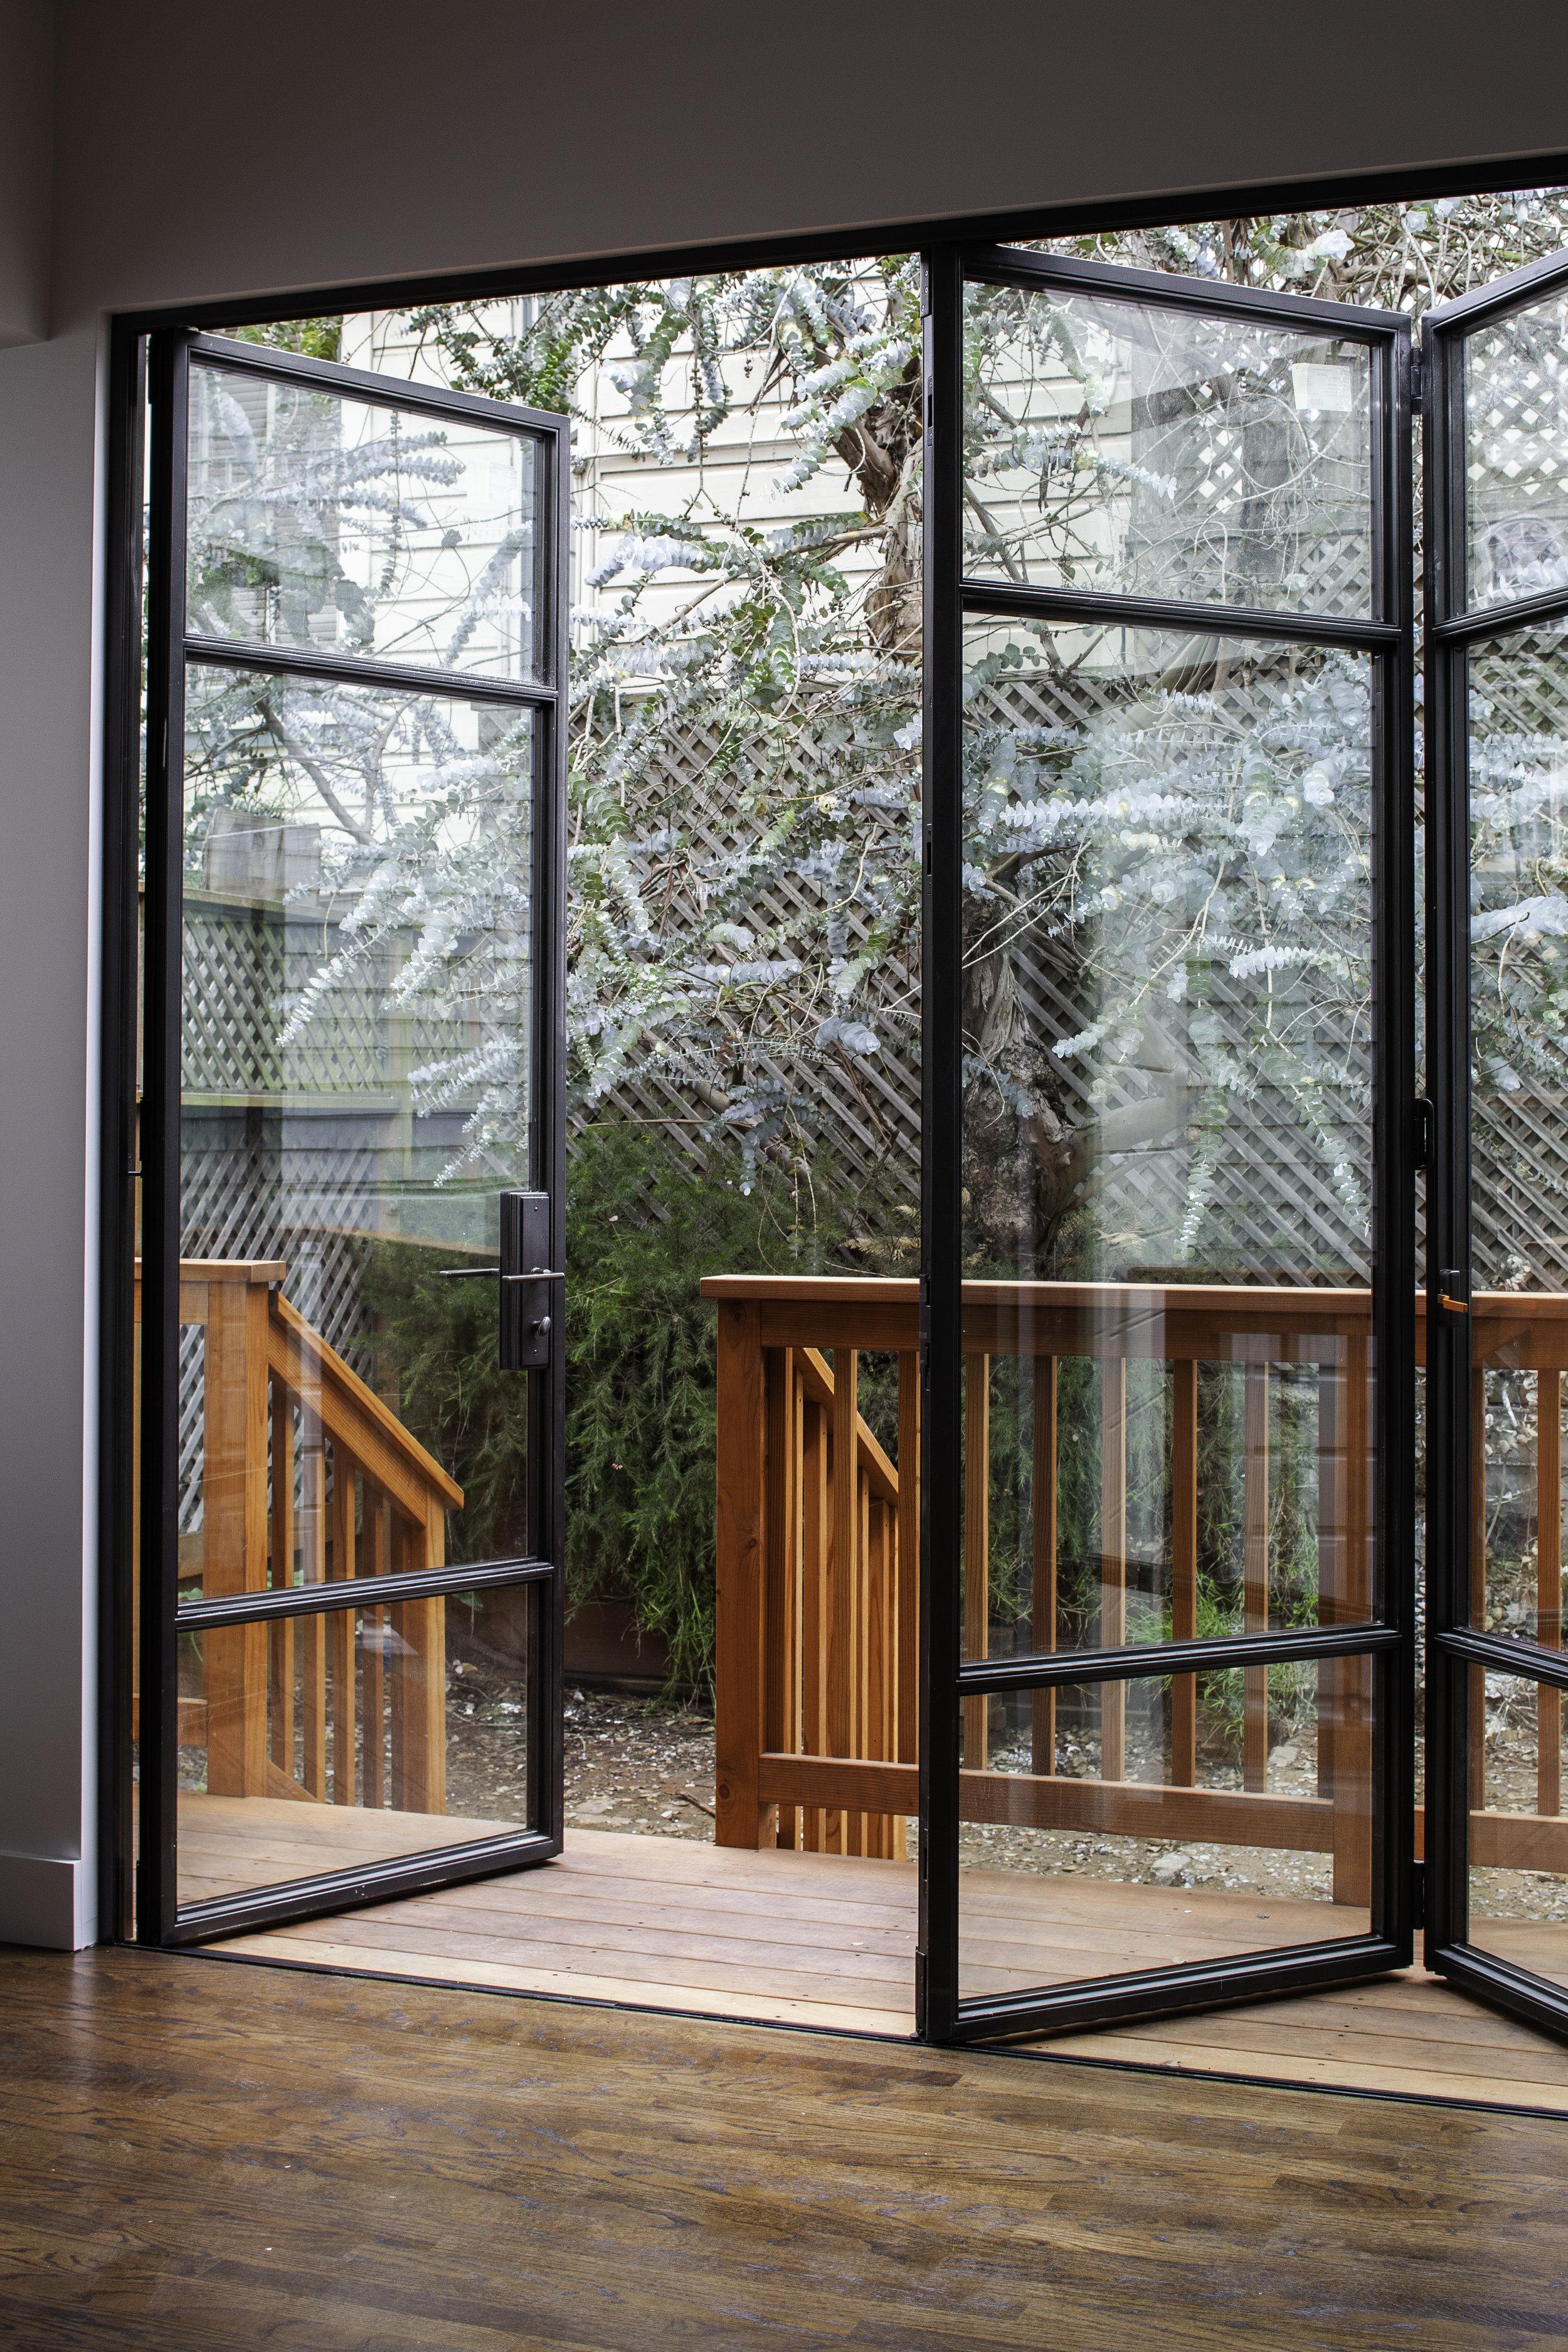 Steel-framed bi-folding doors allow light to flood the kitchen.